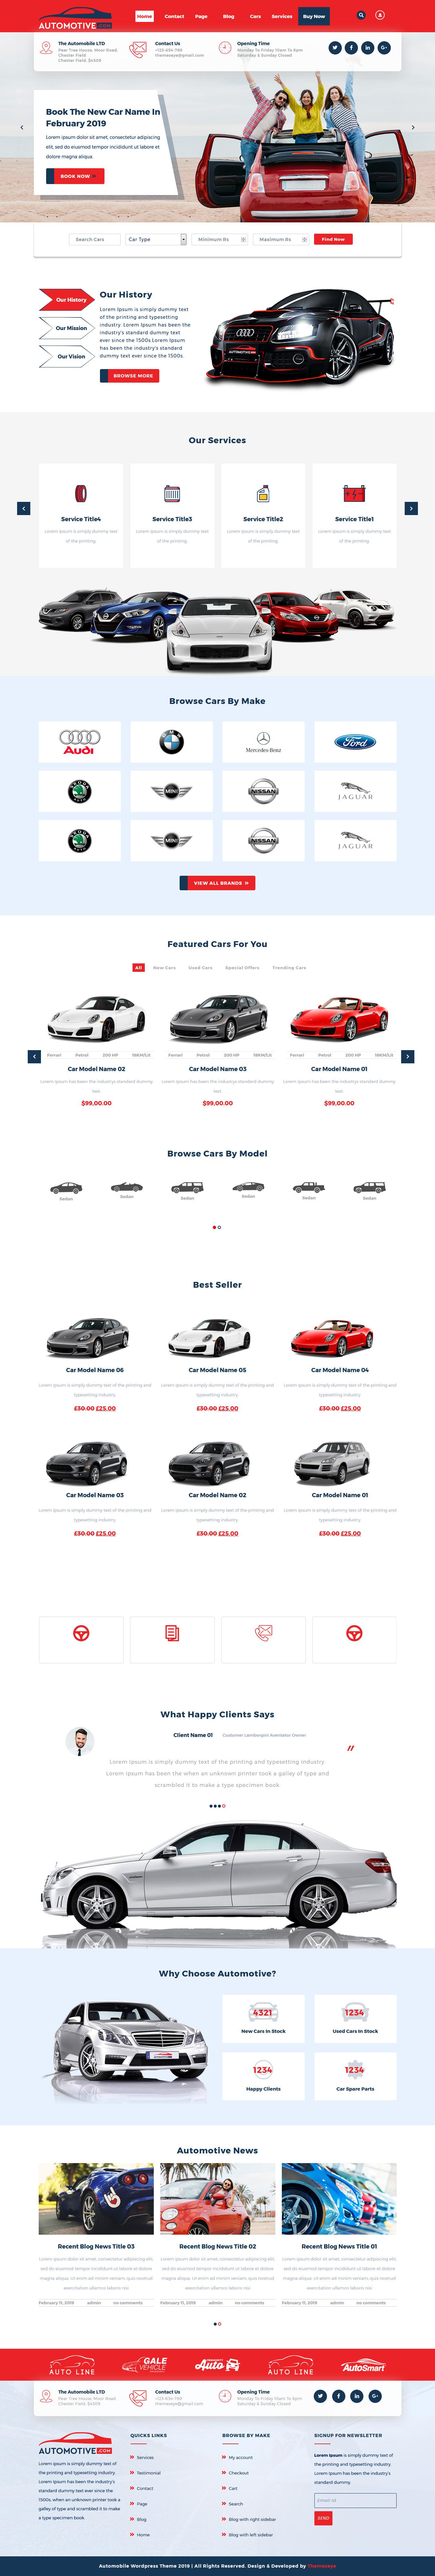 sayara automotive best free automobile wordpress theme - 10+ Best Free Automobile WordPress Themes